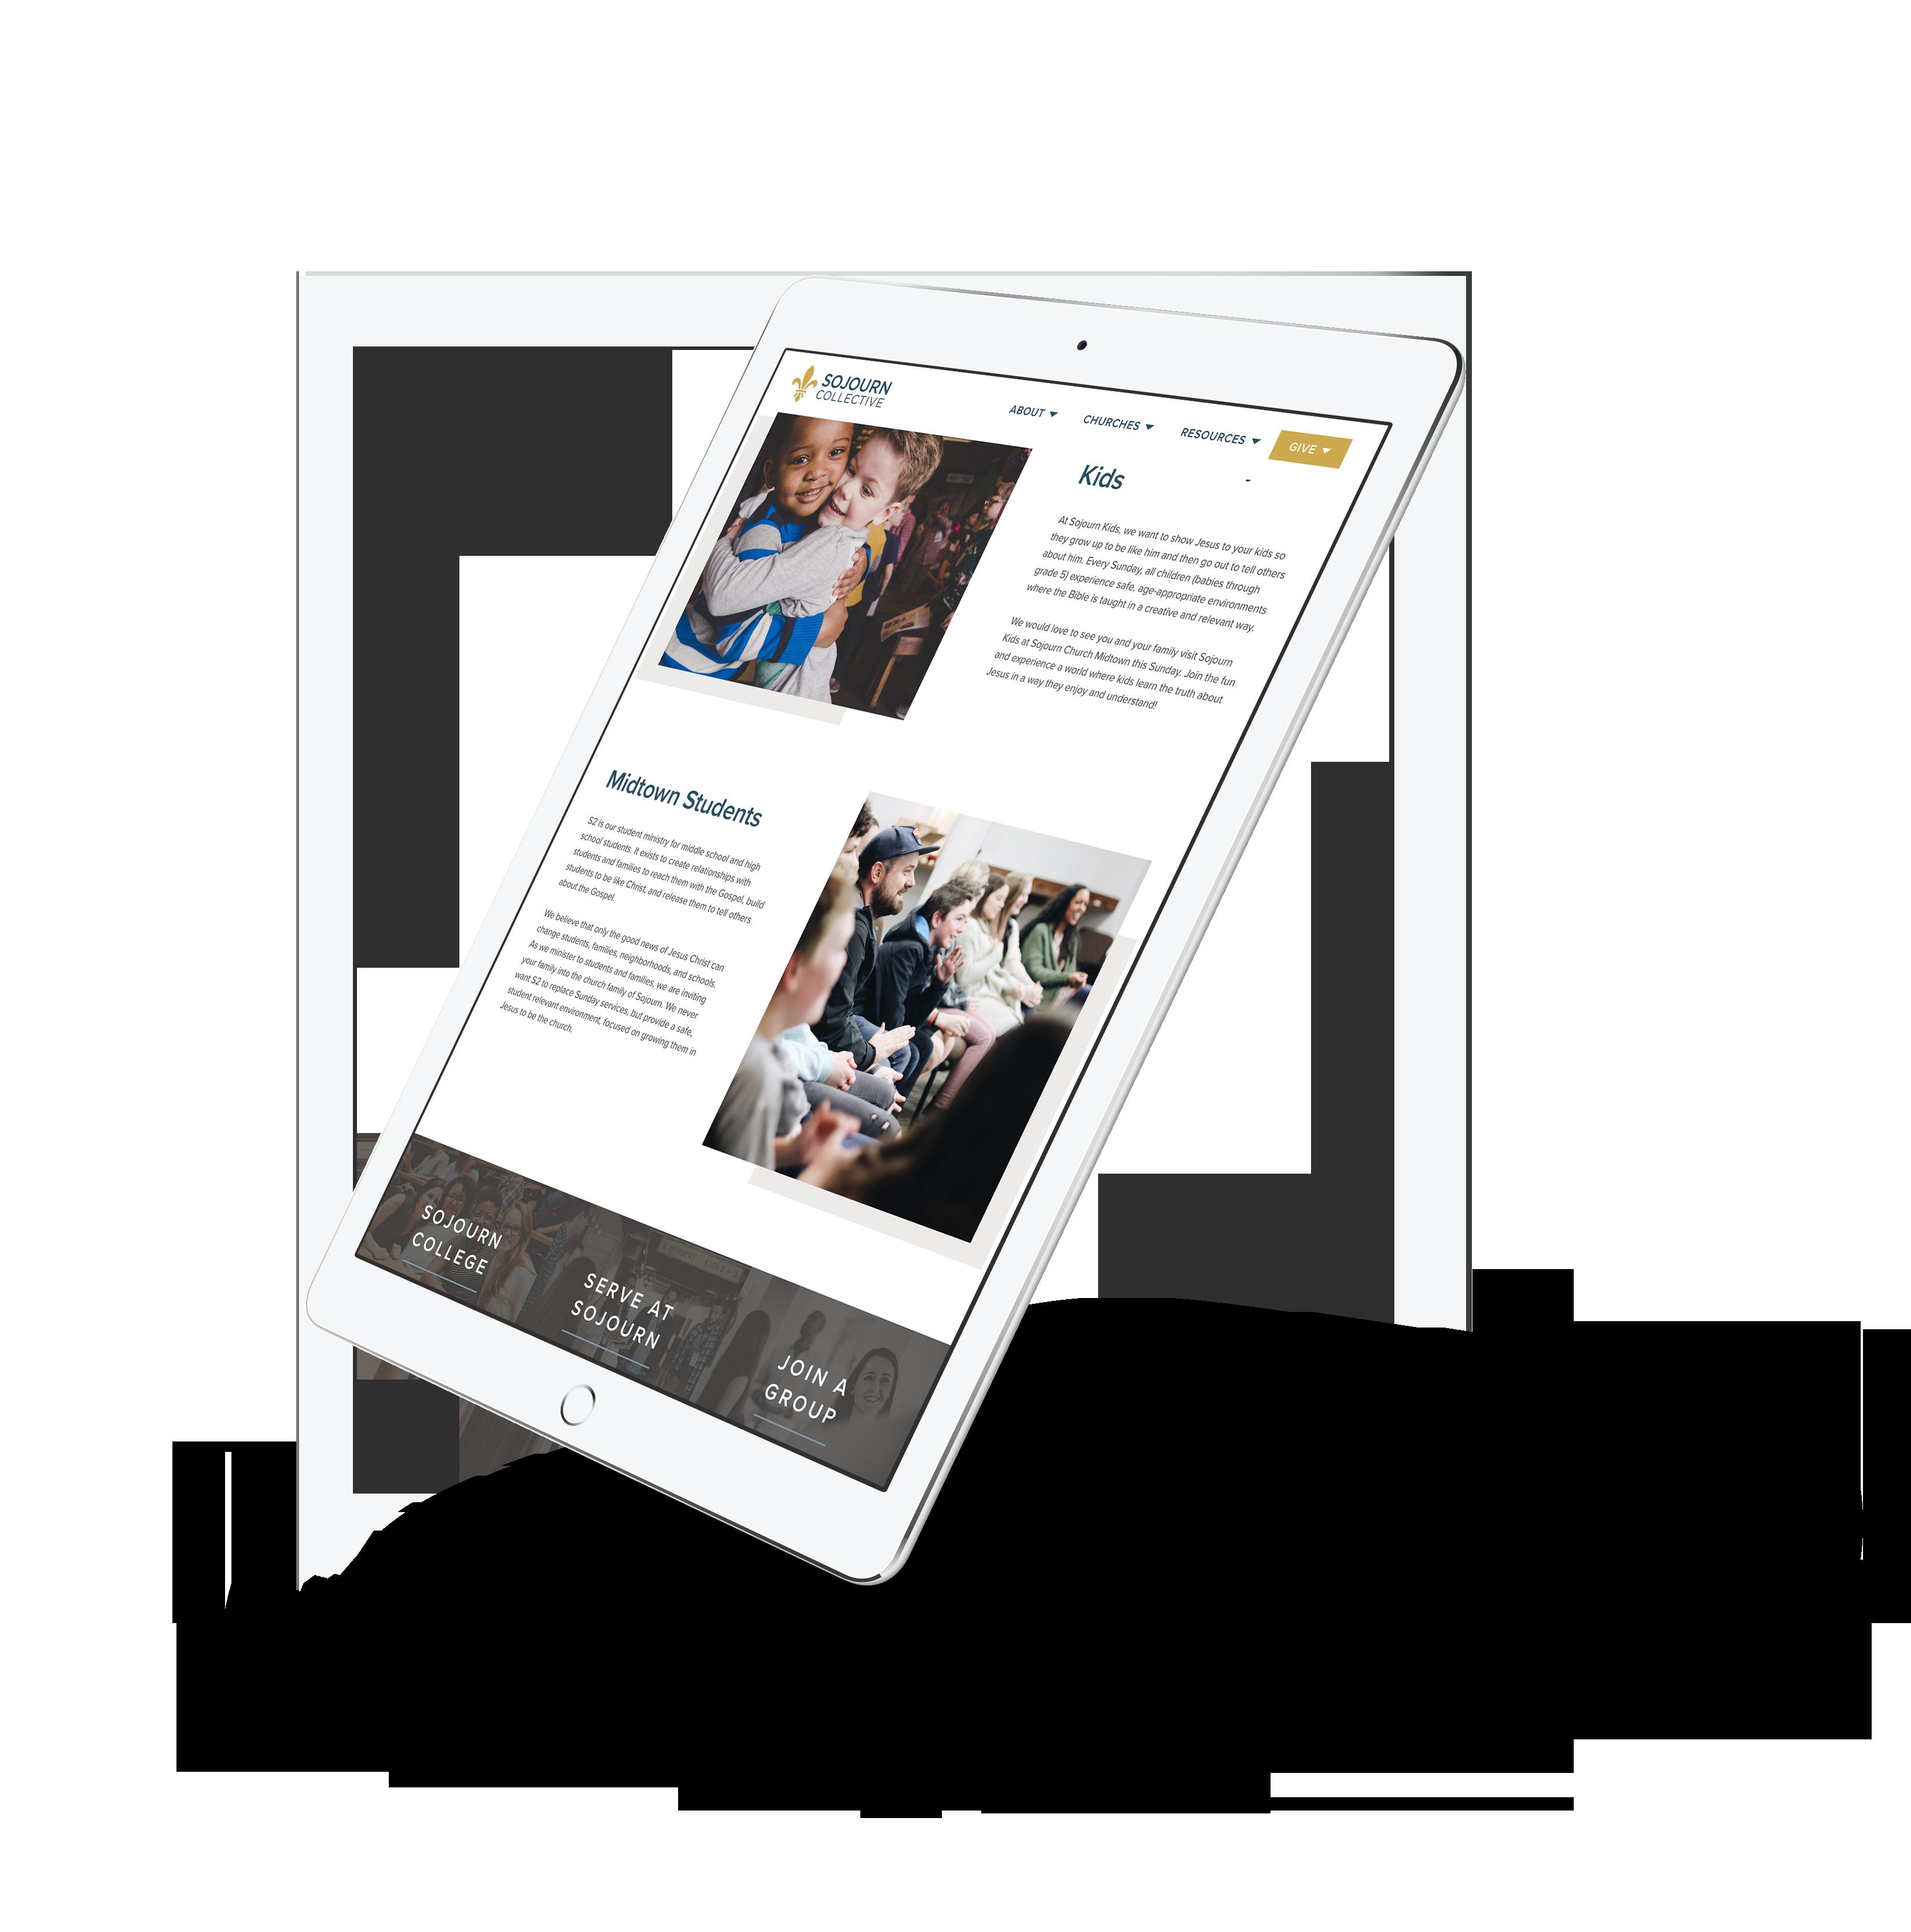 SCC_iPadAir2Mockup_Portrait_Page